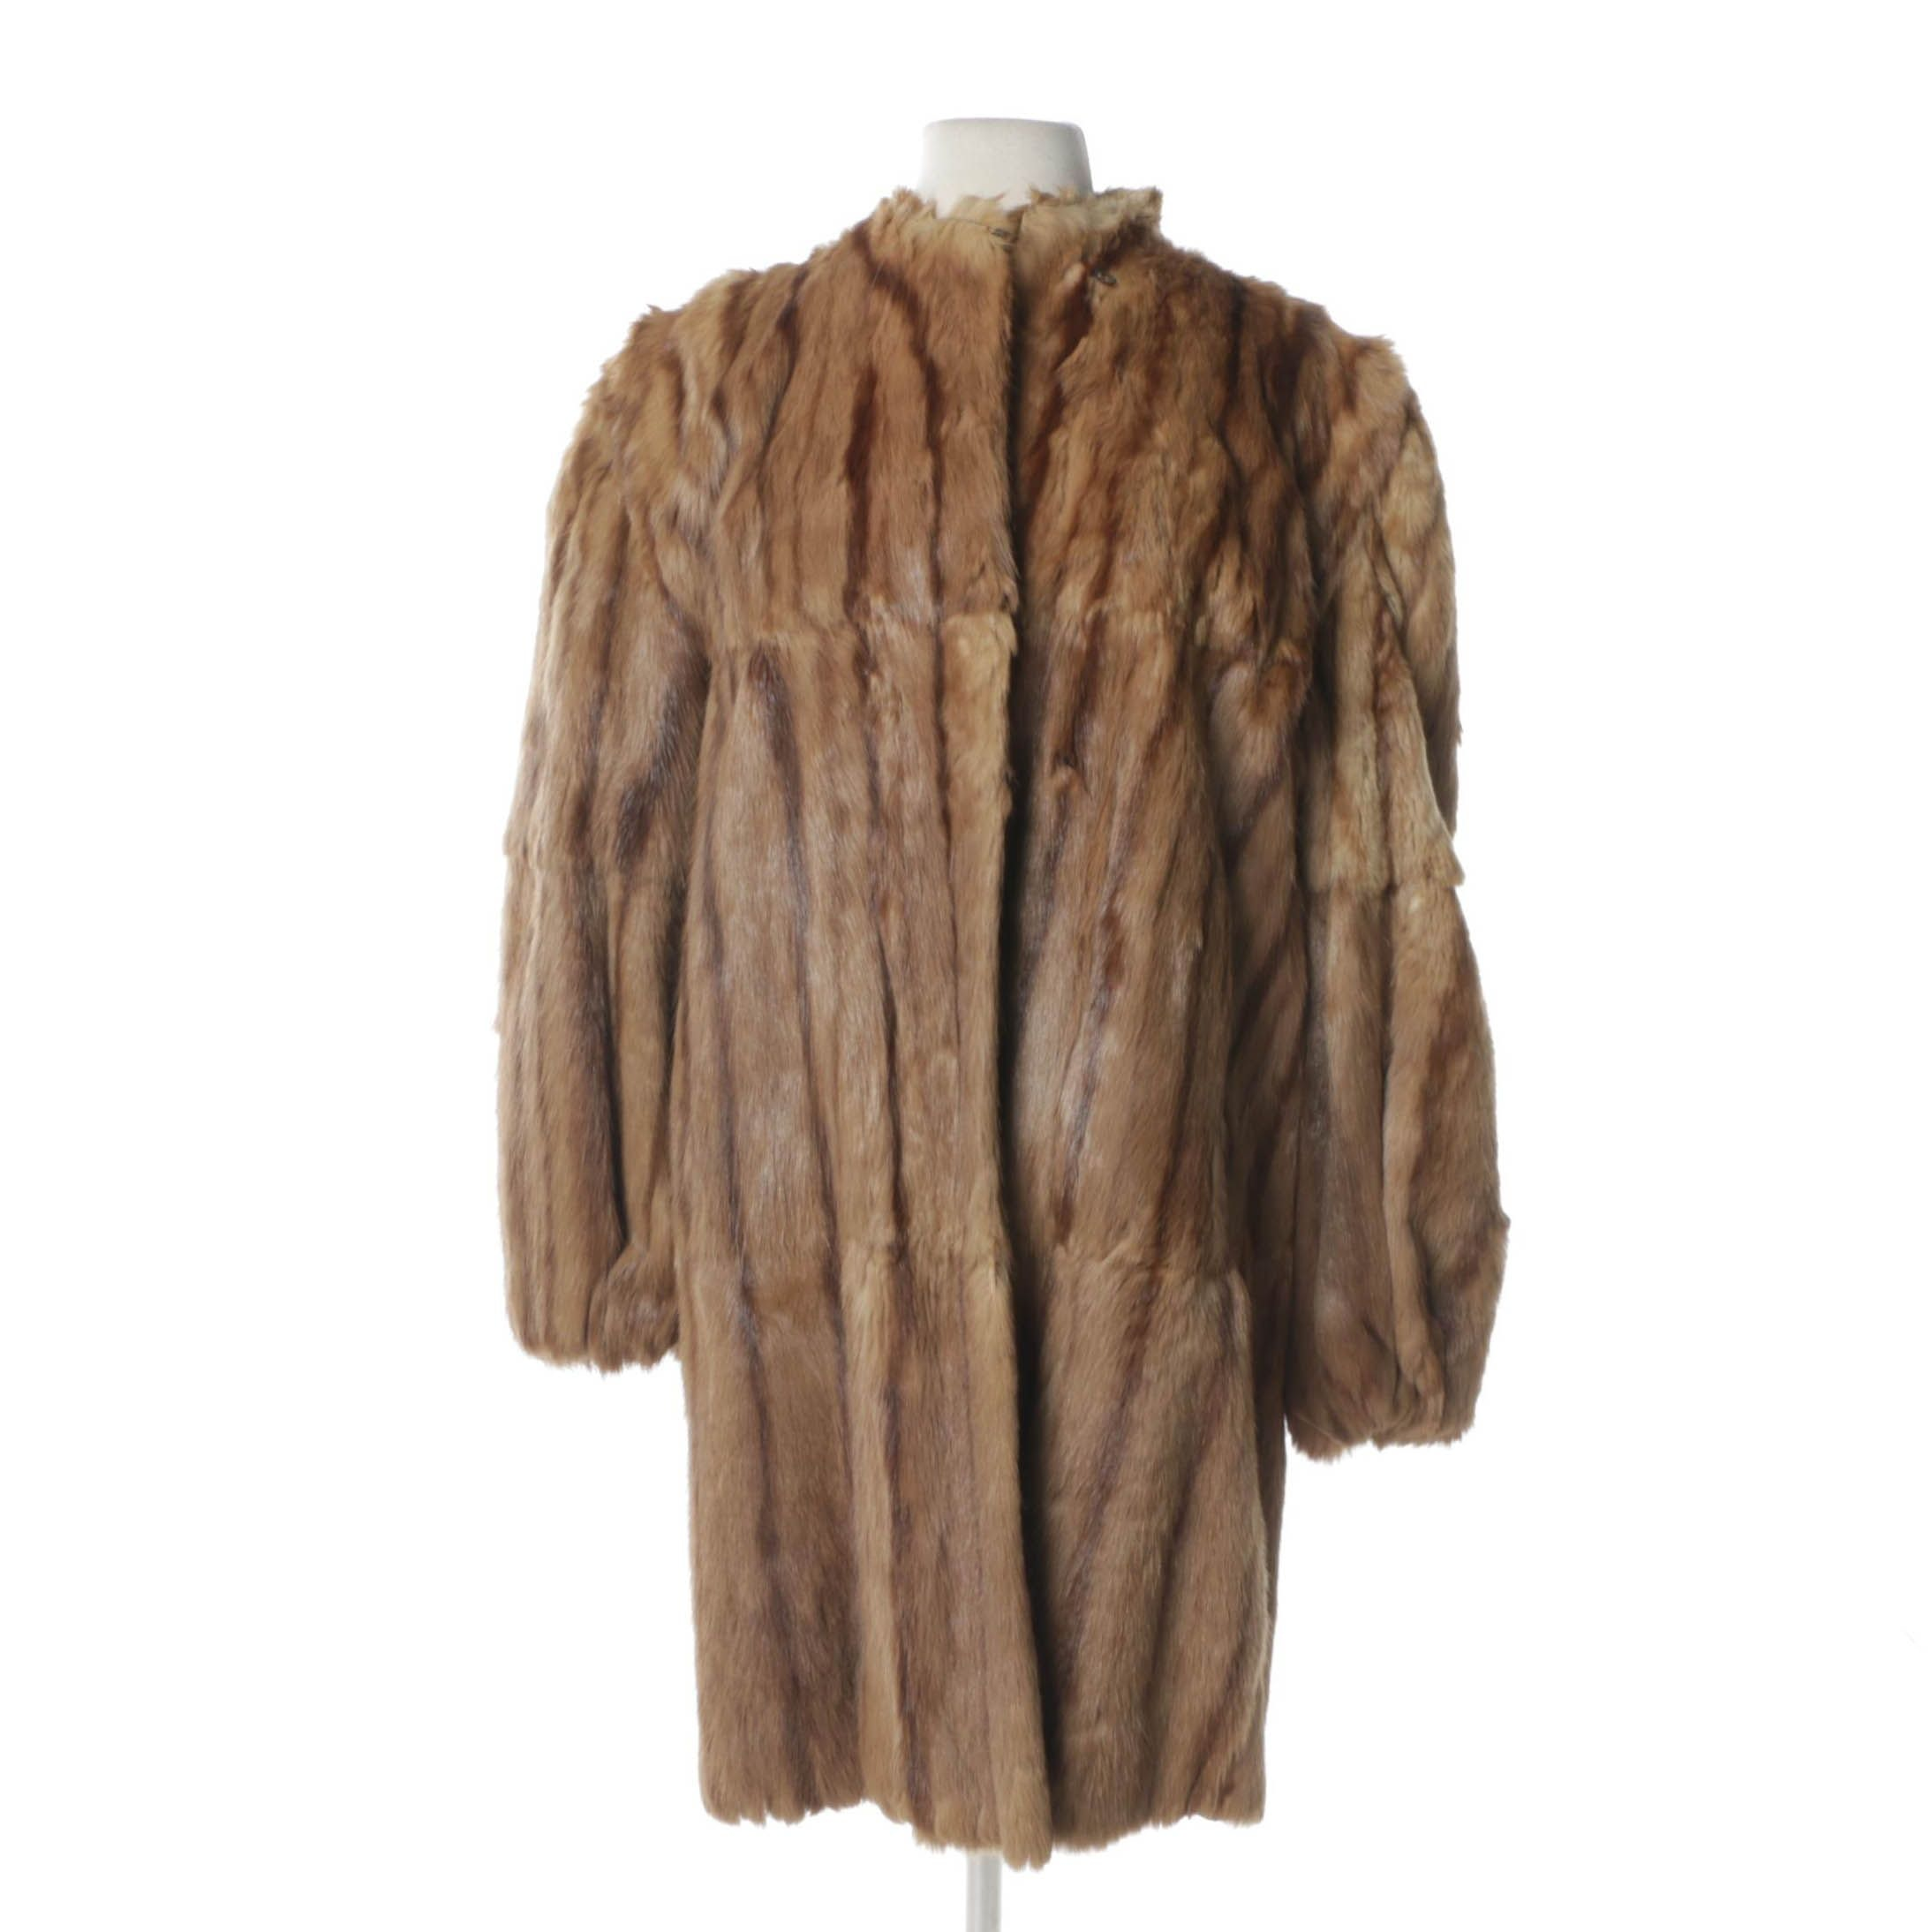 Women's Vintage Davidson's Indiana Fur Co. Marmot Fur Coat